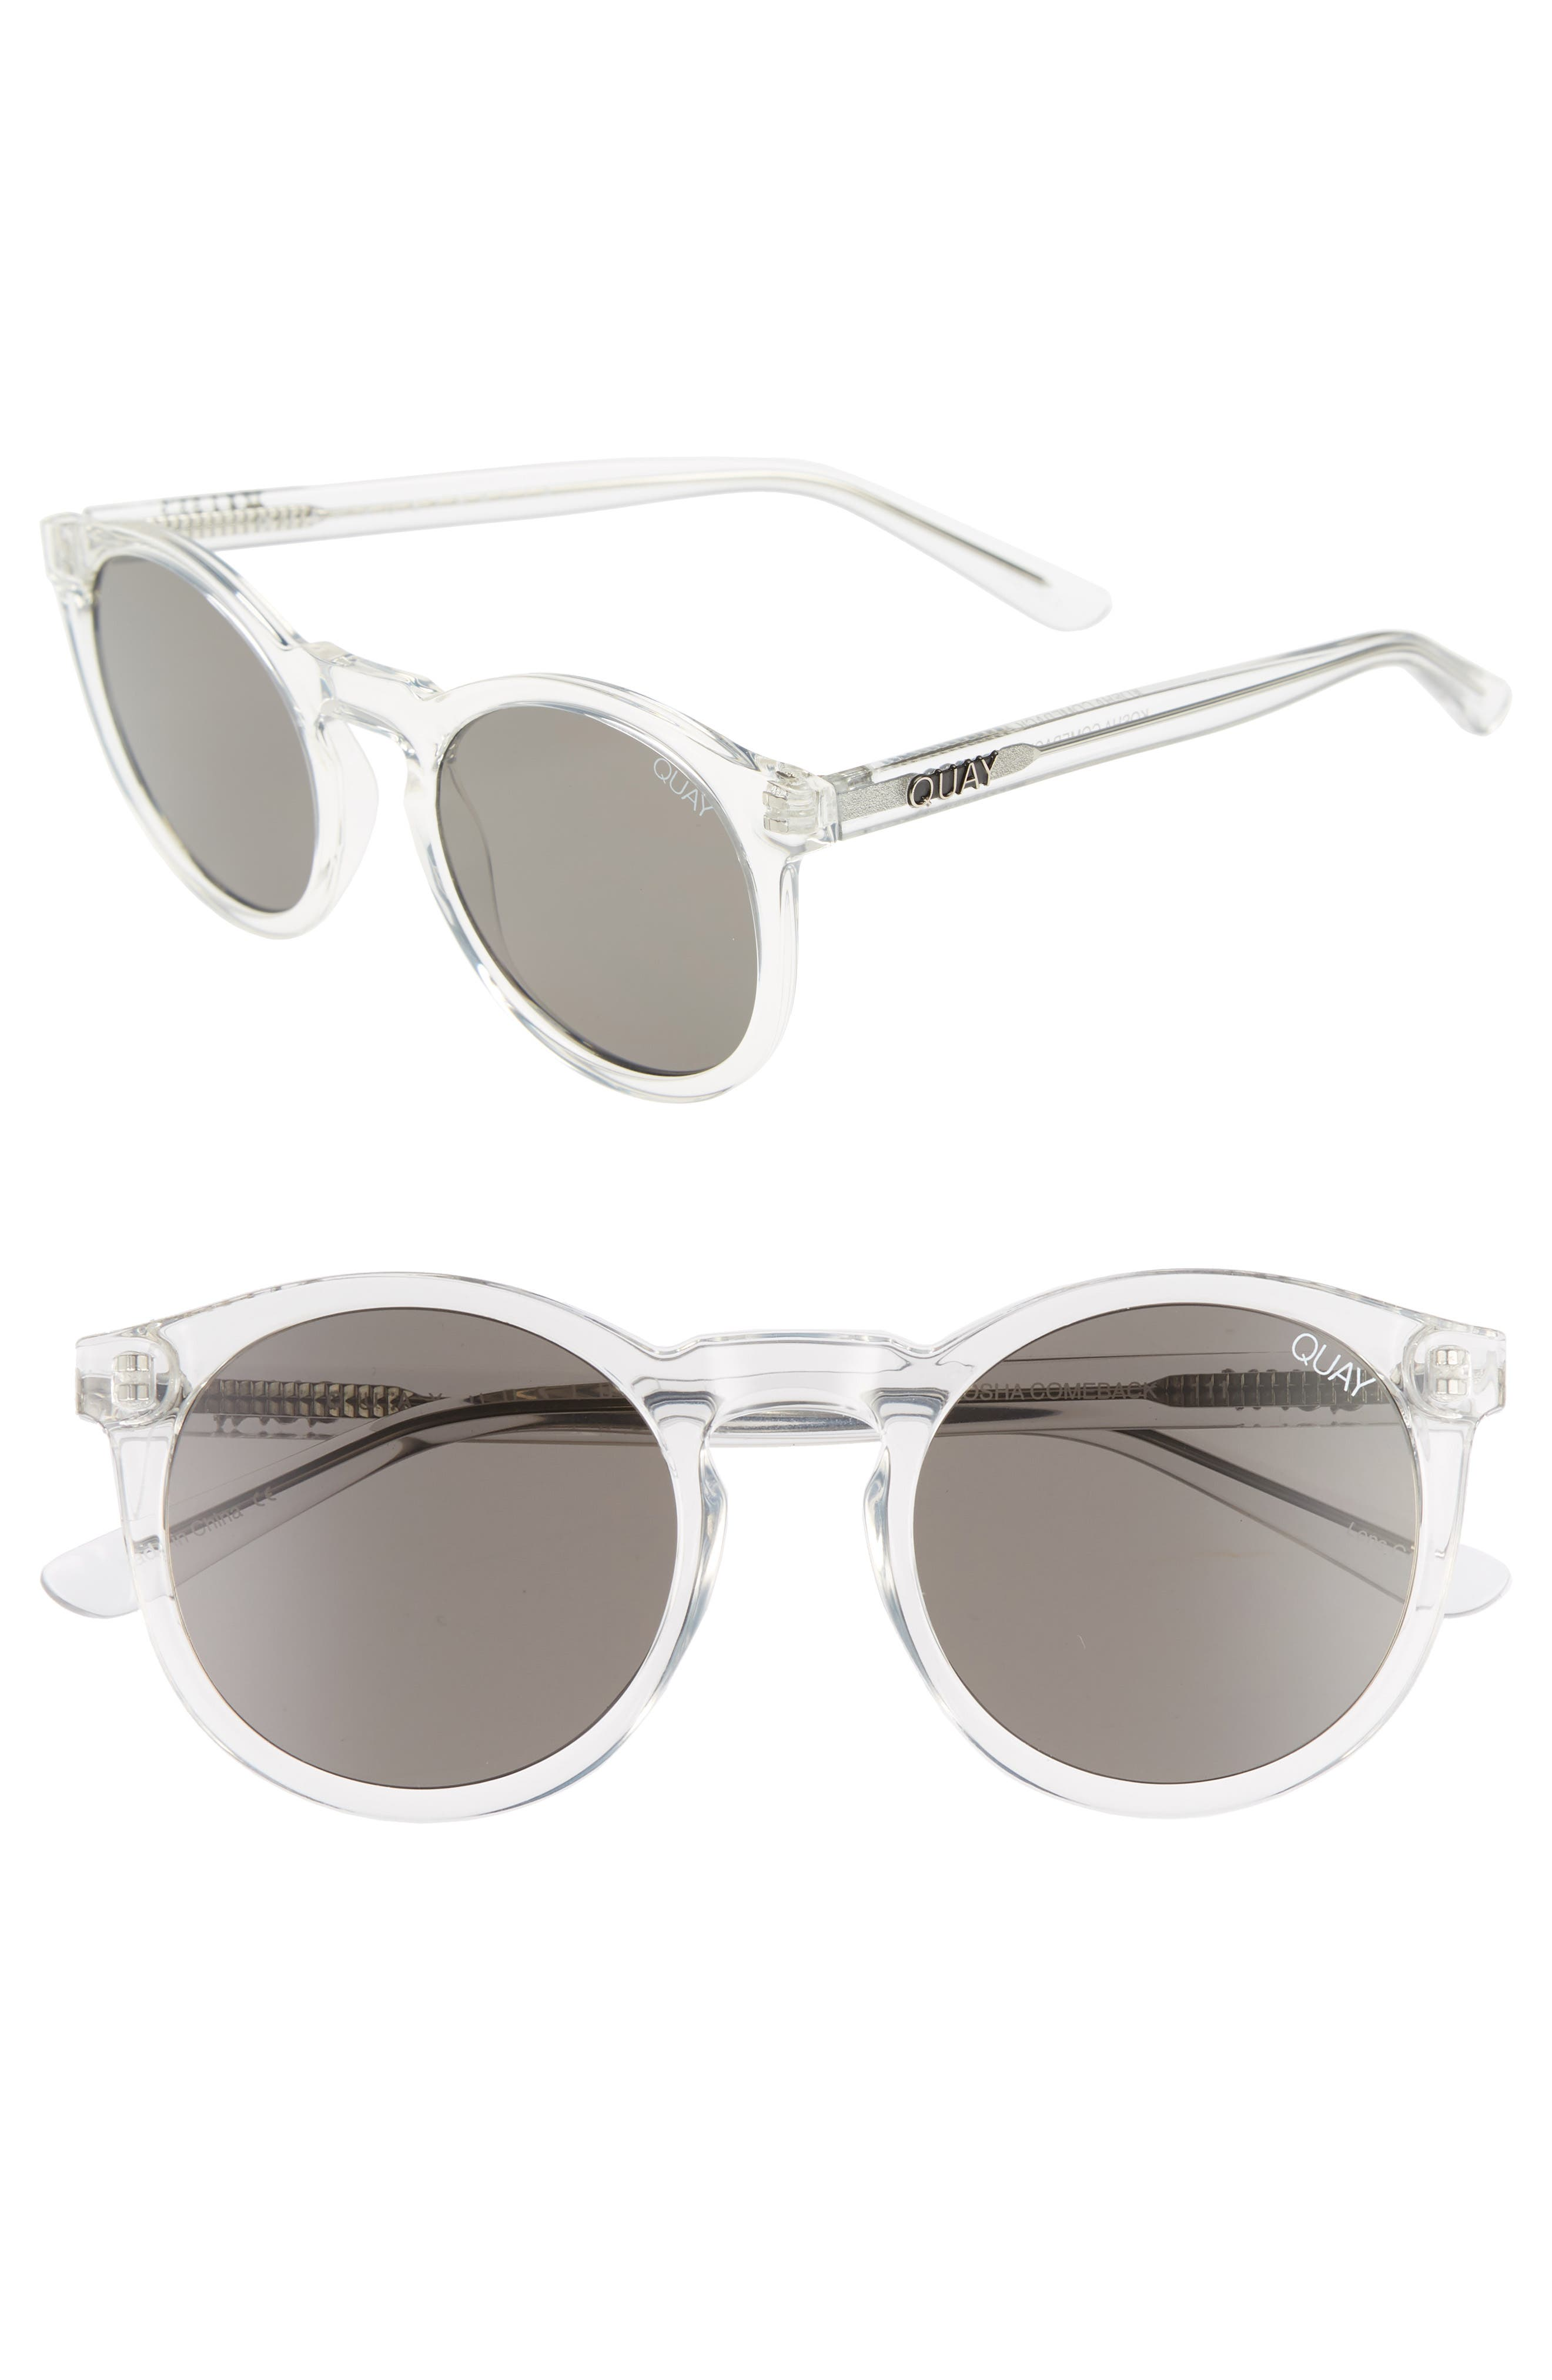 Kosha 49mm Round Sunglasses,                             Main thumbnail 1, color,                             100